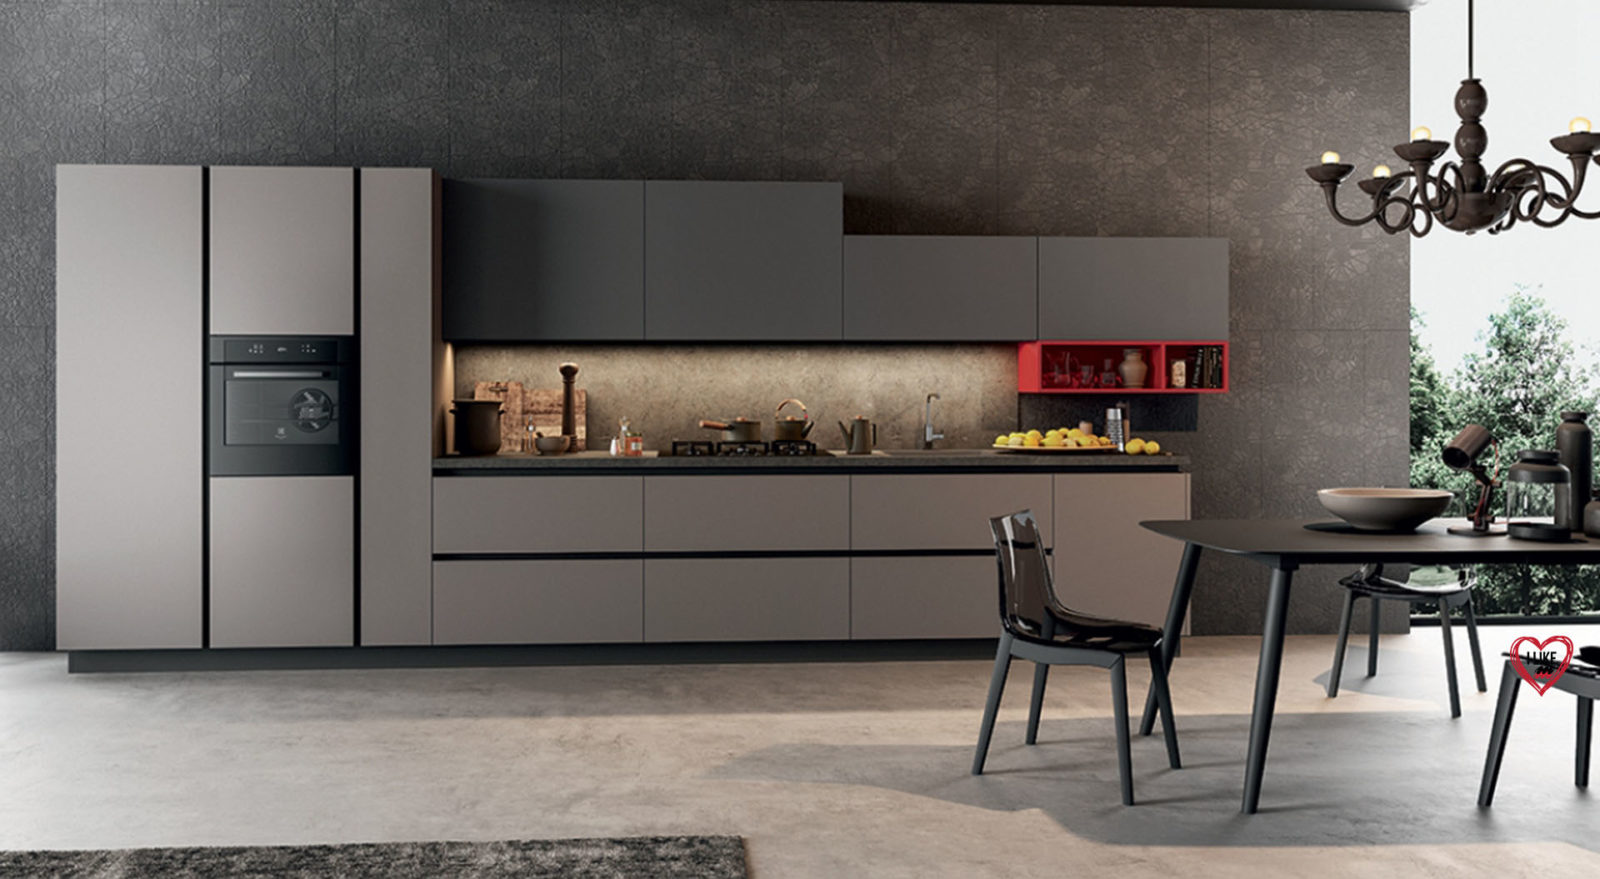 Cucine moderne lineari jw02 regardsdefemmes for Cucina moderna 330